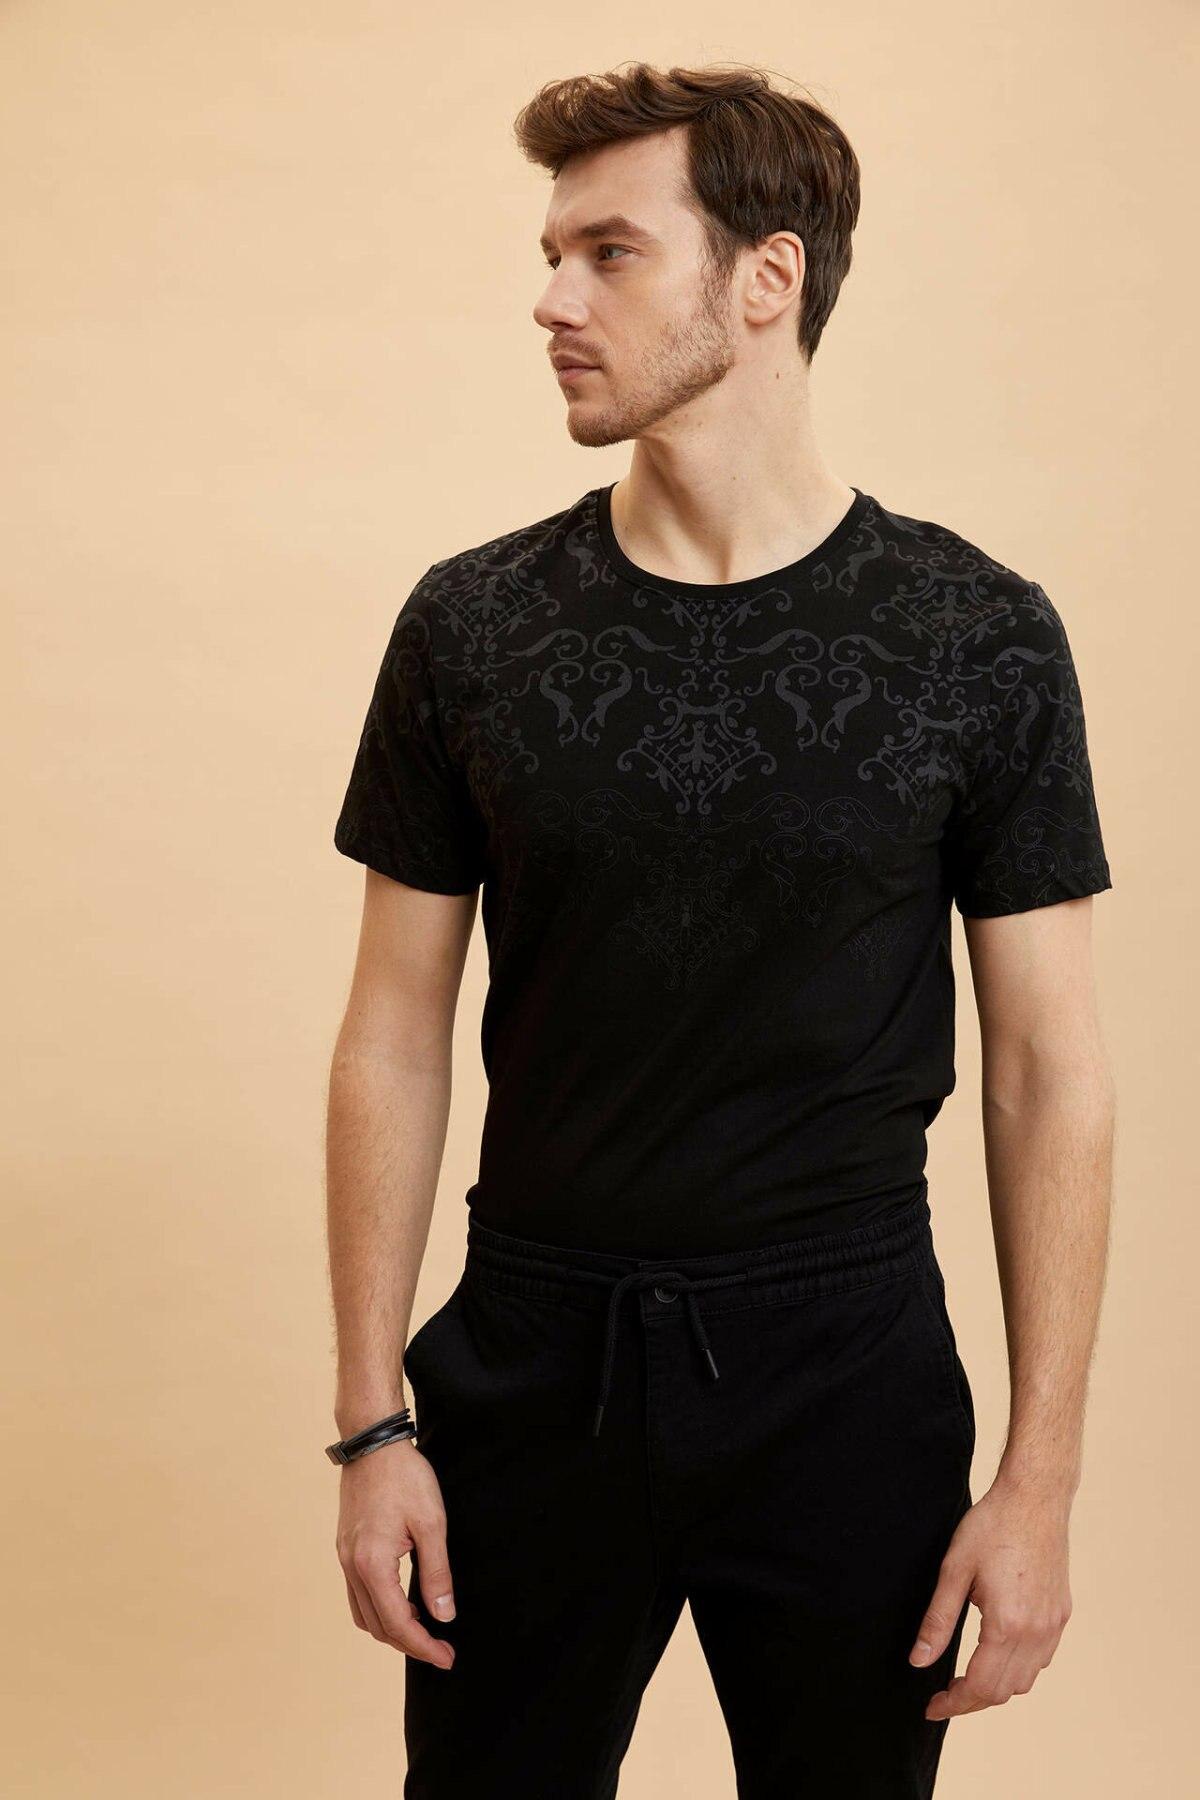 DeFacto Man Summer Black Top Tees Men Casual Short Sleeve T-Shirts Male O-neck T-Shirt-M2798AZ19HS